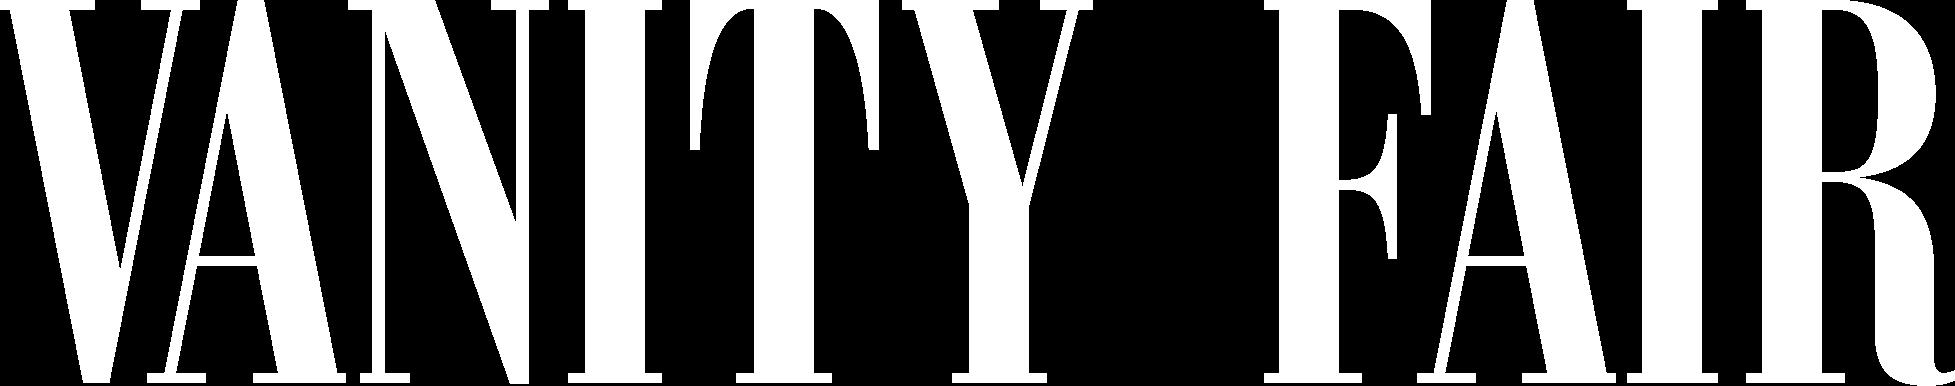 Vanity_Fair_Logo.-1-2.png